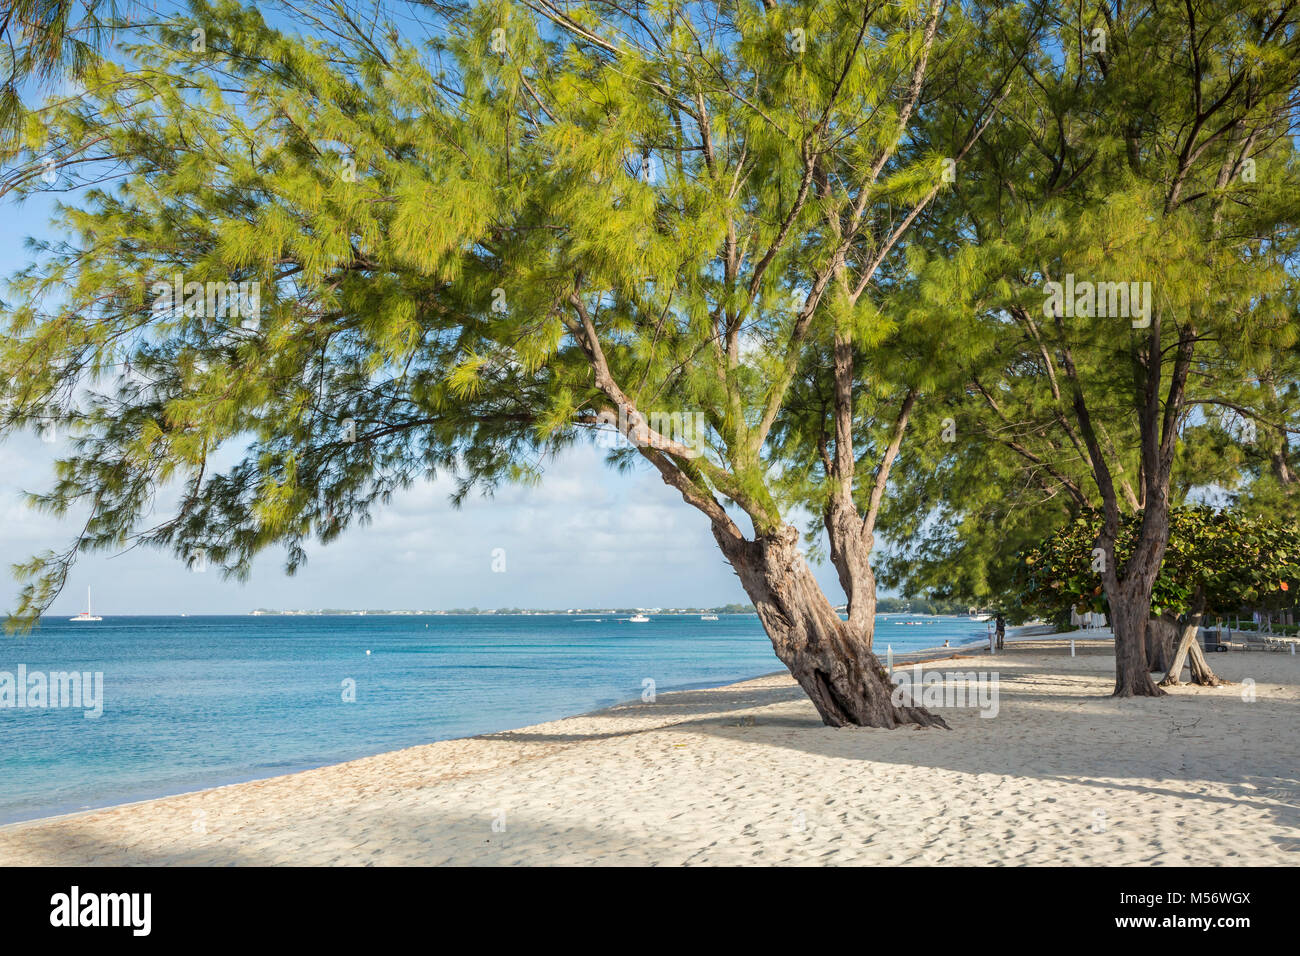 Graceful Casuarina Pine Trees on Seven Mile Beach on Grnd Cayman, Cayman Islands. - Stock Image